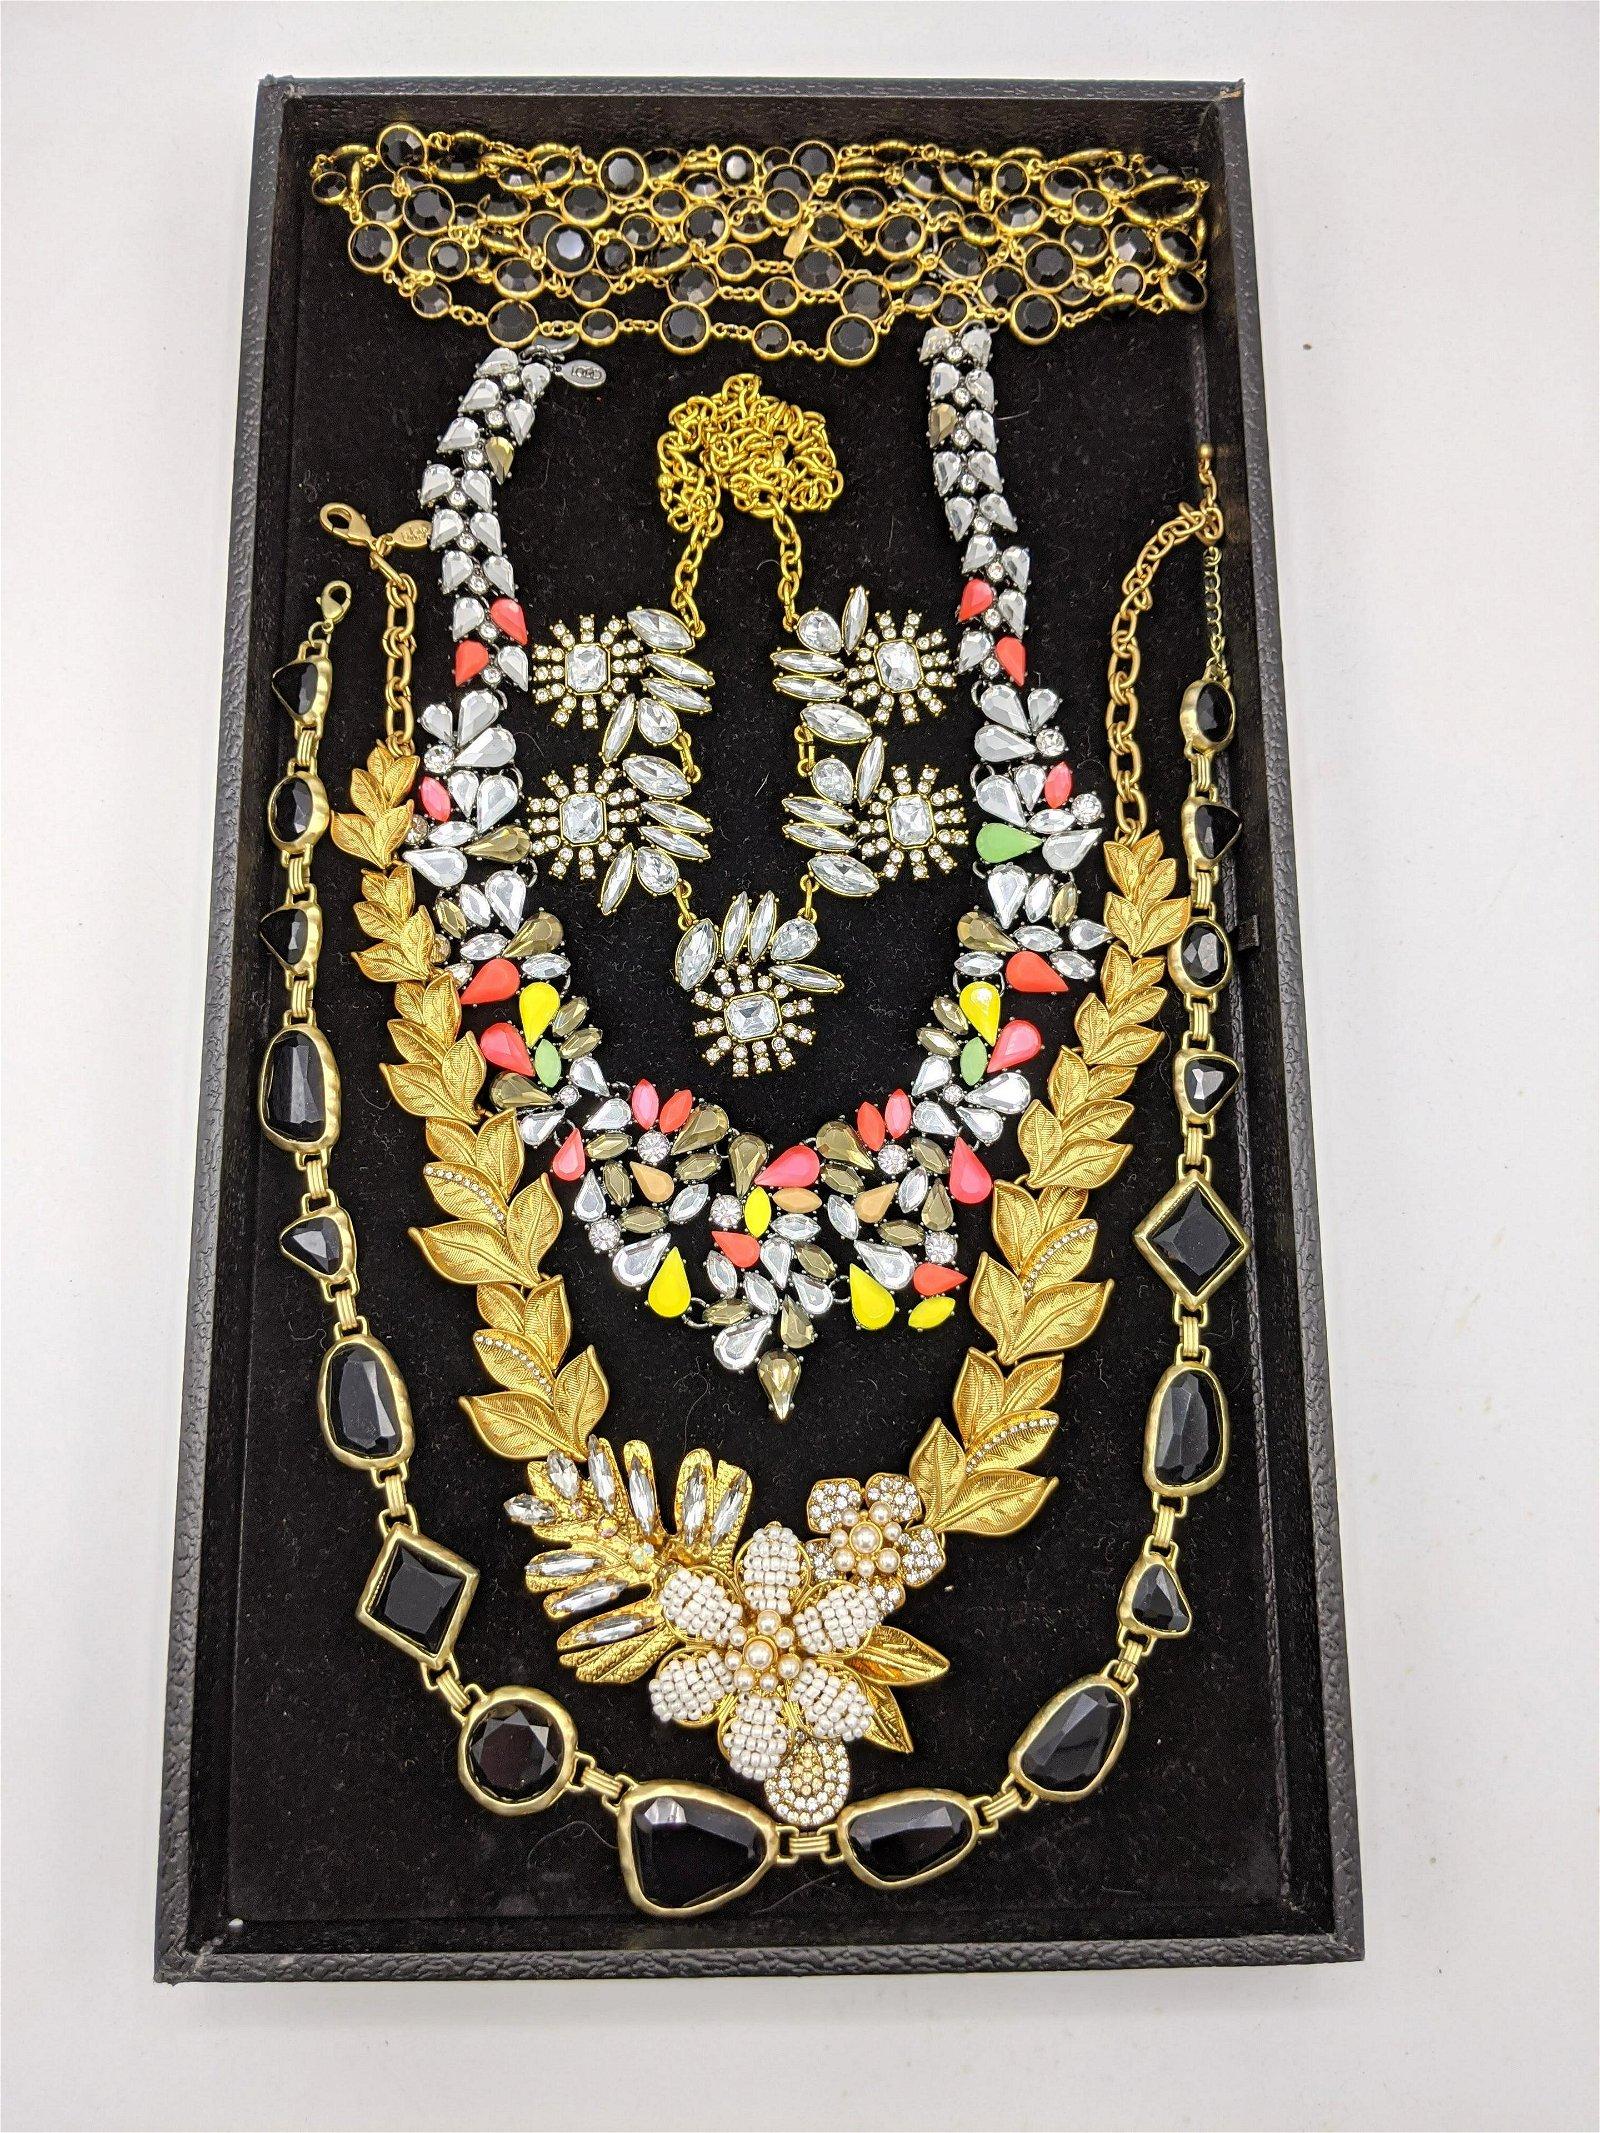 5pc Statement Costume Jewelry Necklaces. Bold designer